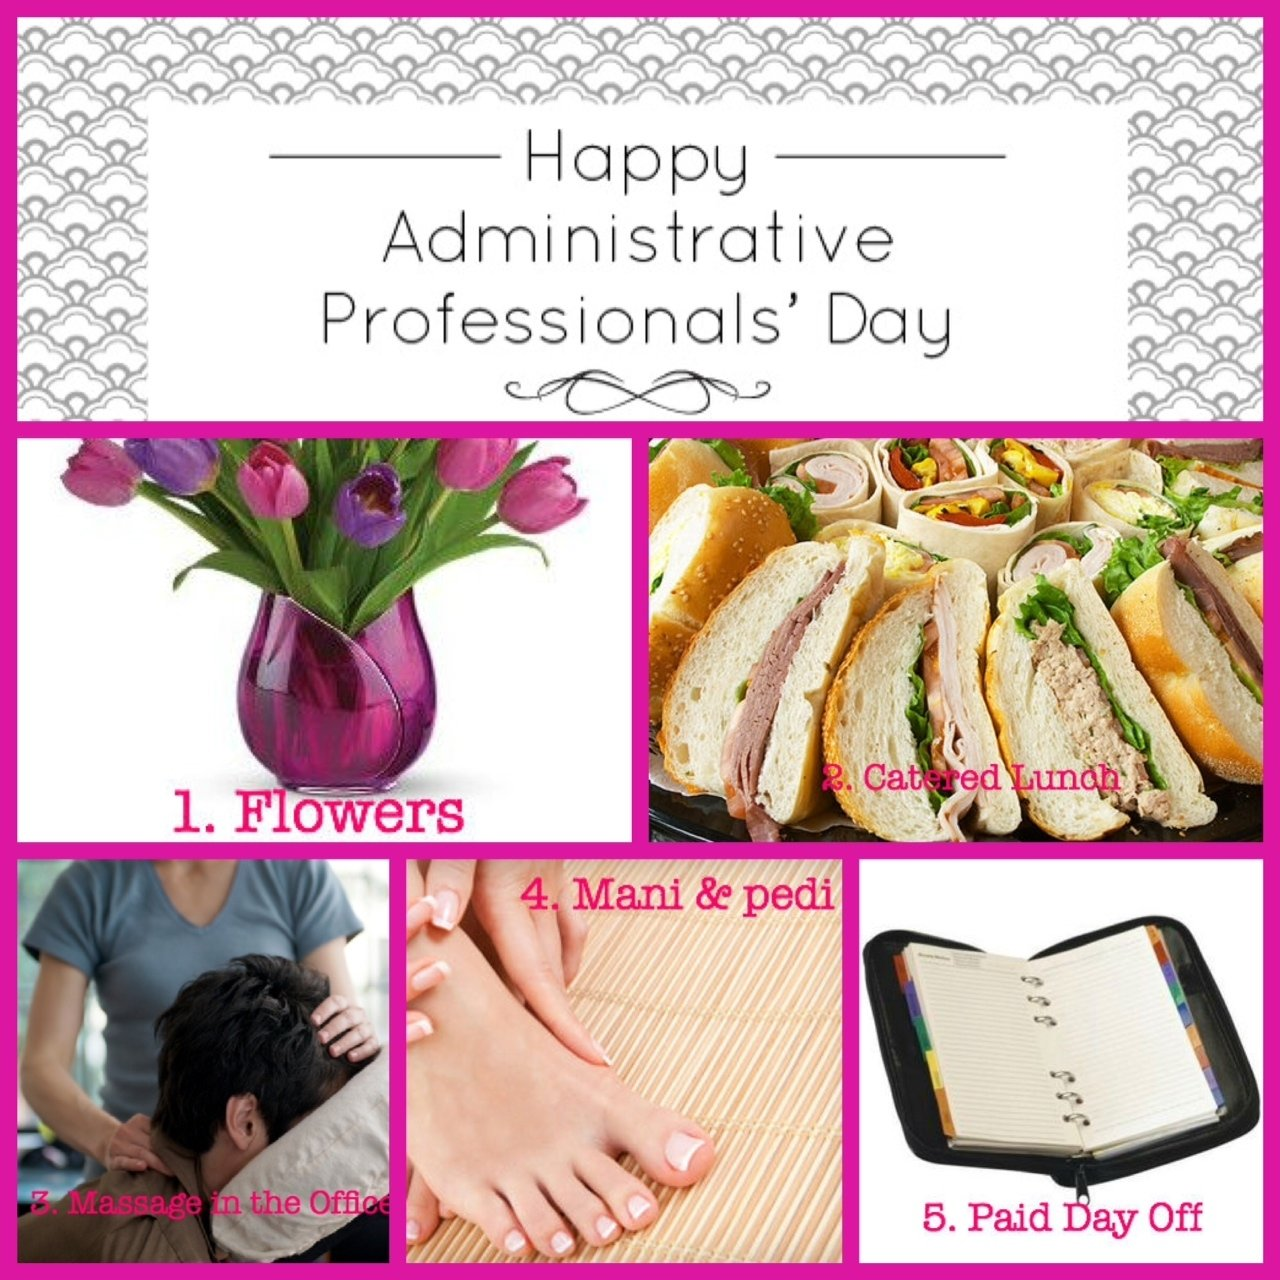 10 Stylish Admin Professionals Day Gift Ideas 5 fab gift ideas for administrative professionals day 6 2021